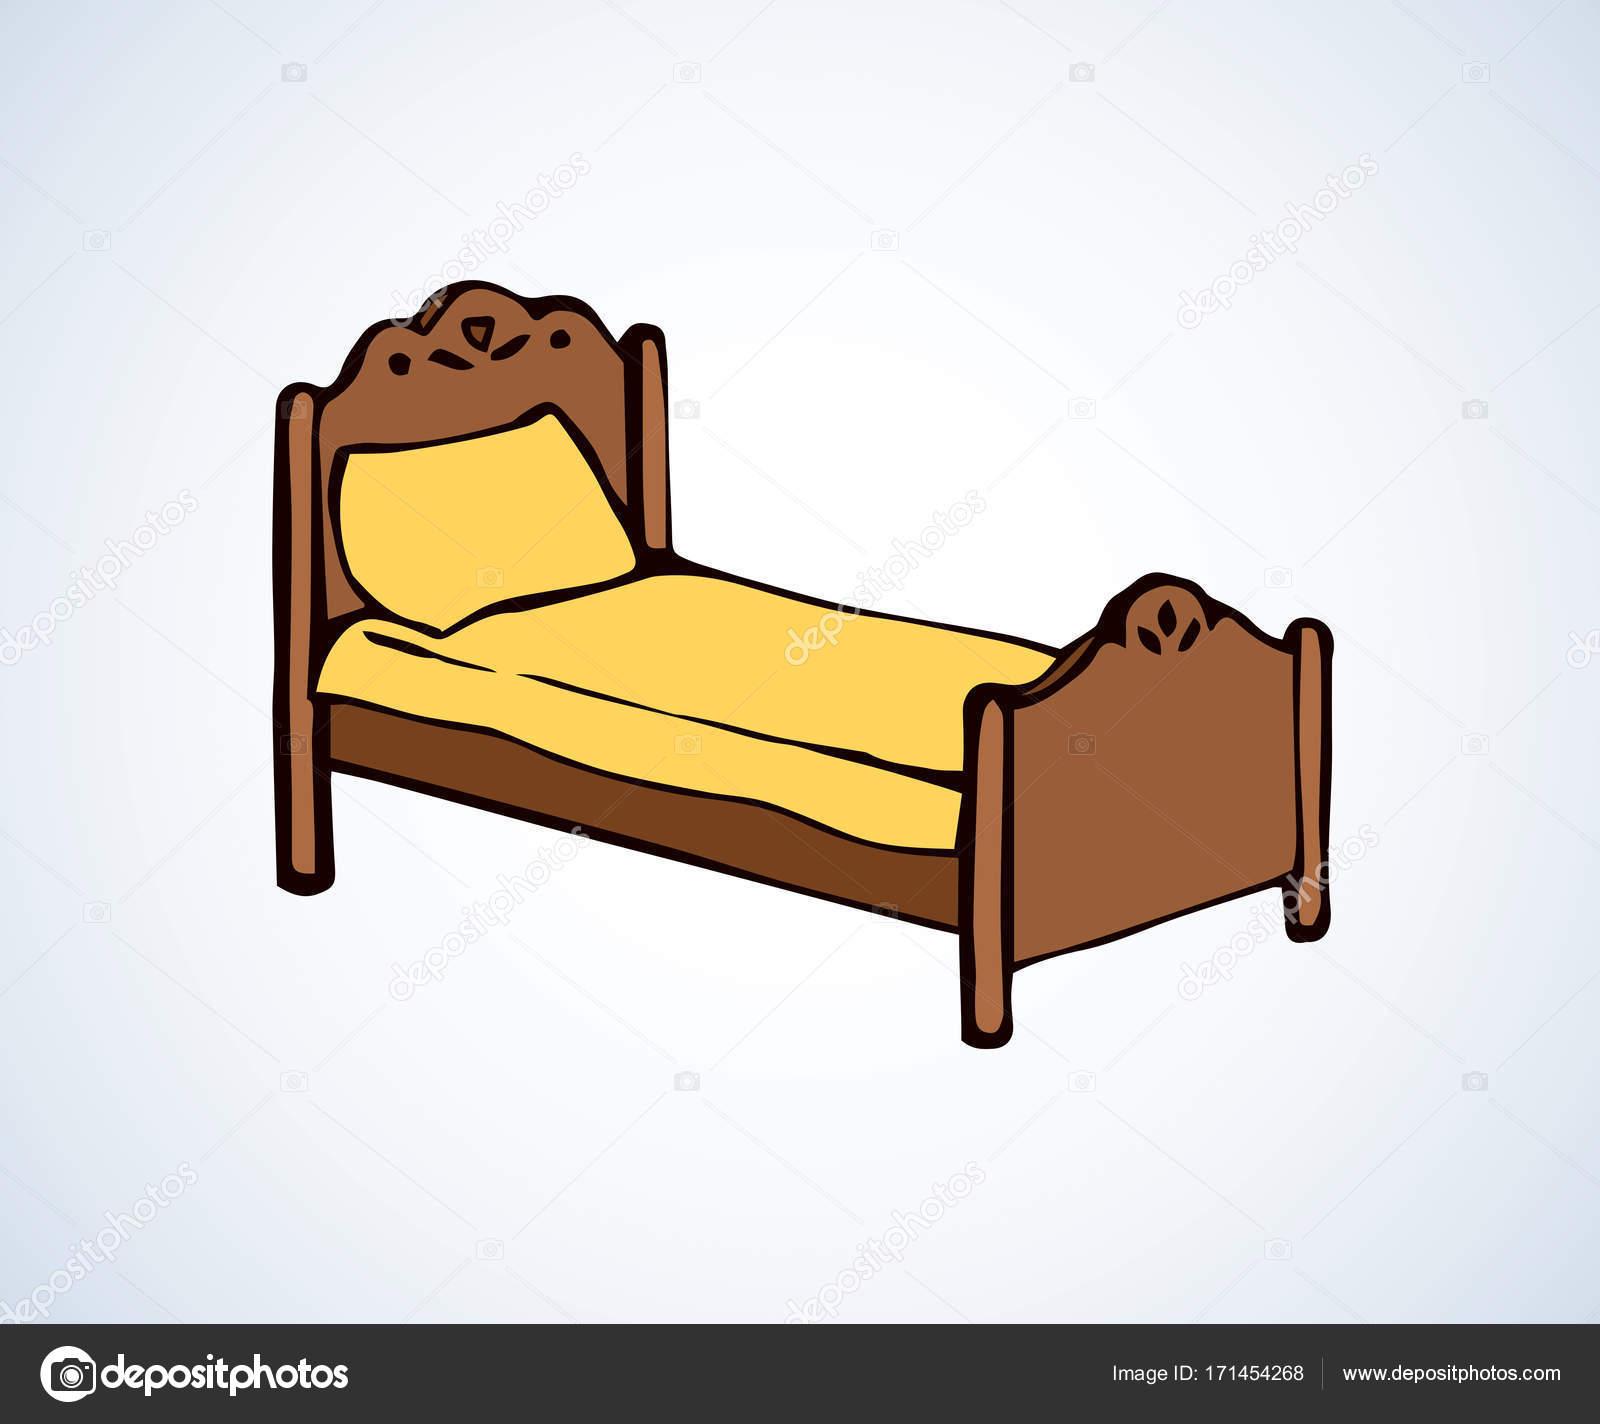 bed vector tekening stockvector marinka 171454268. Black Bedroom Furniture Sets. Home Design Ideas